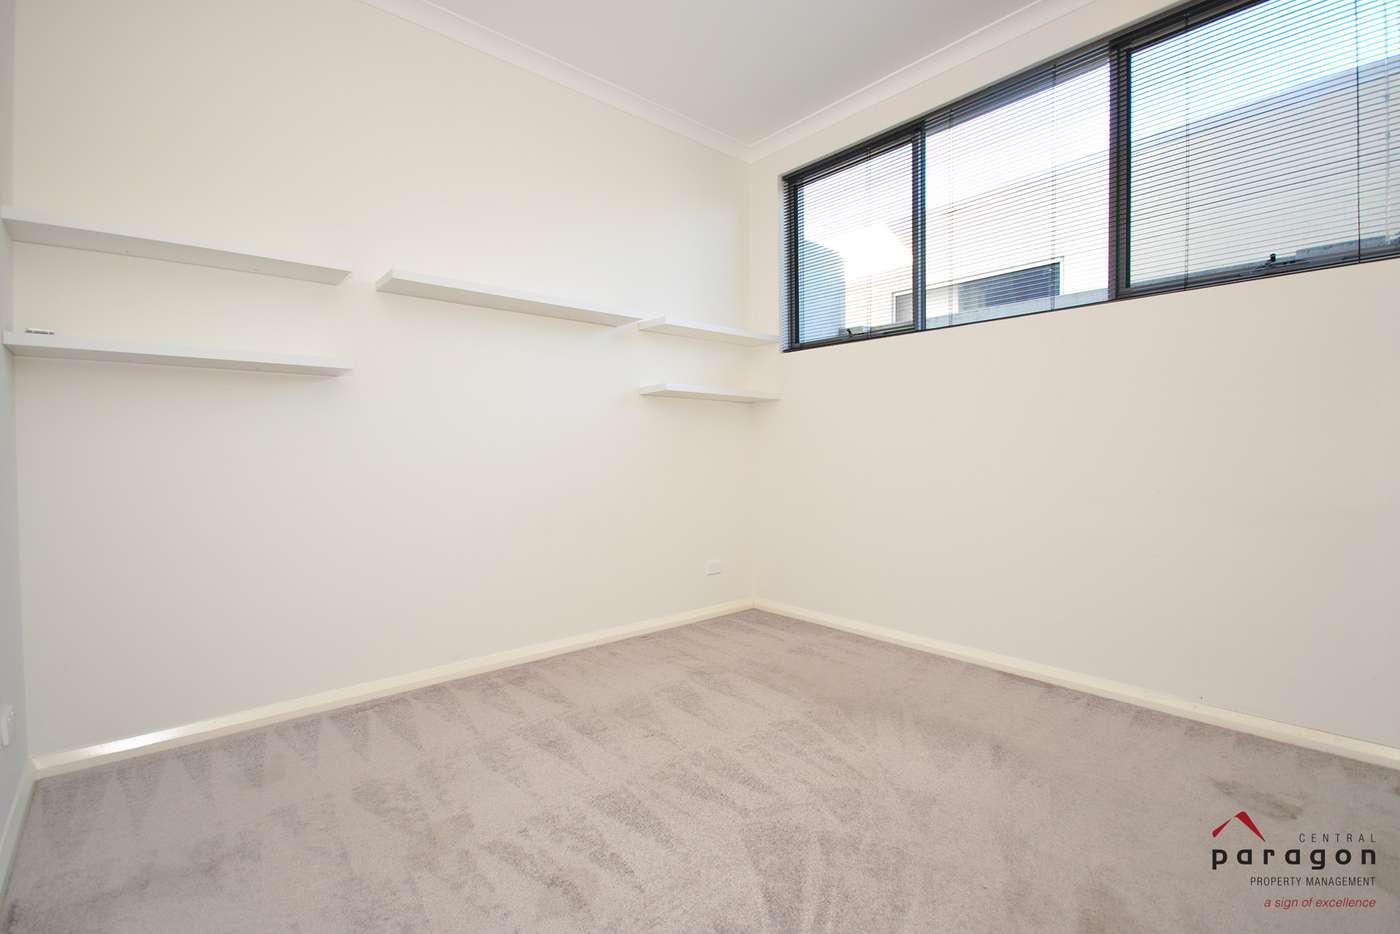 Seventh view of Homely apartment listing, 1/4 Waterloo Street, Joondanna WA 6060